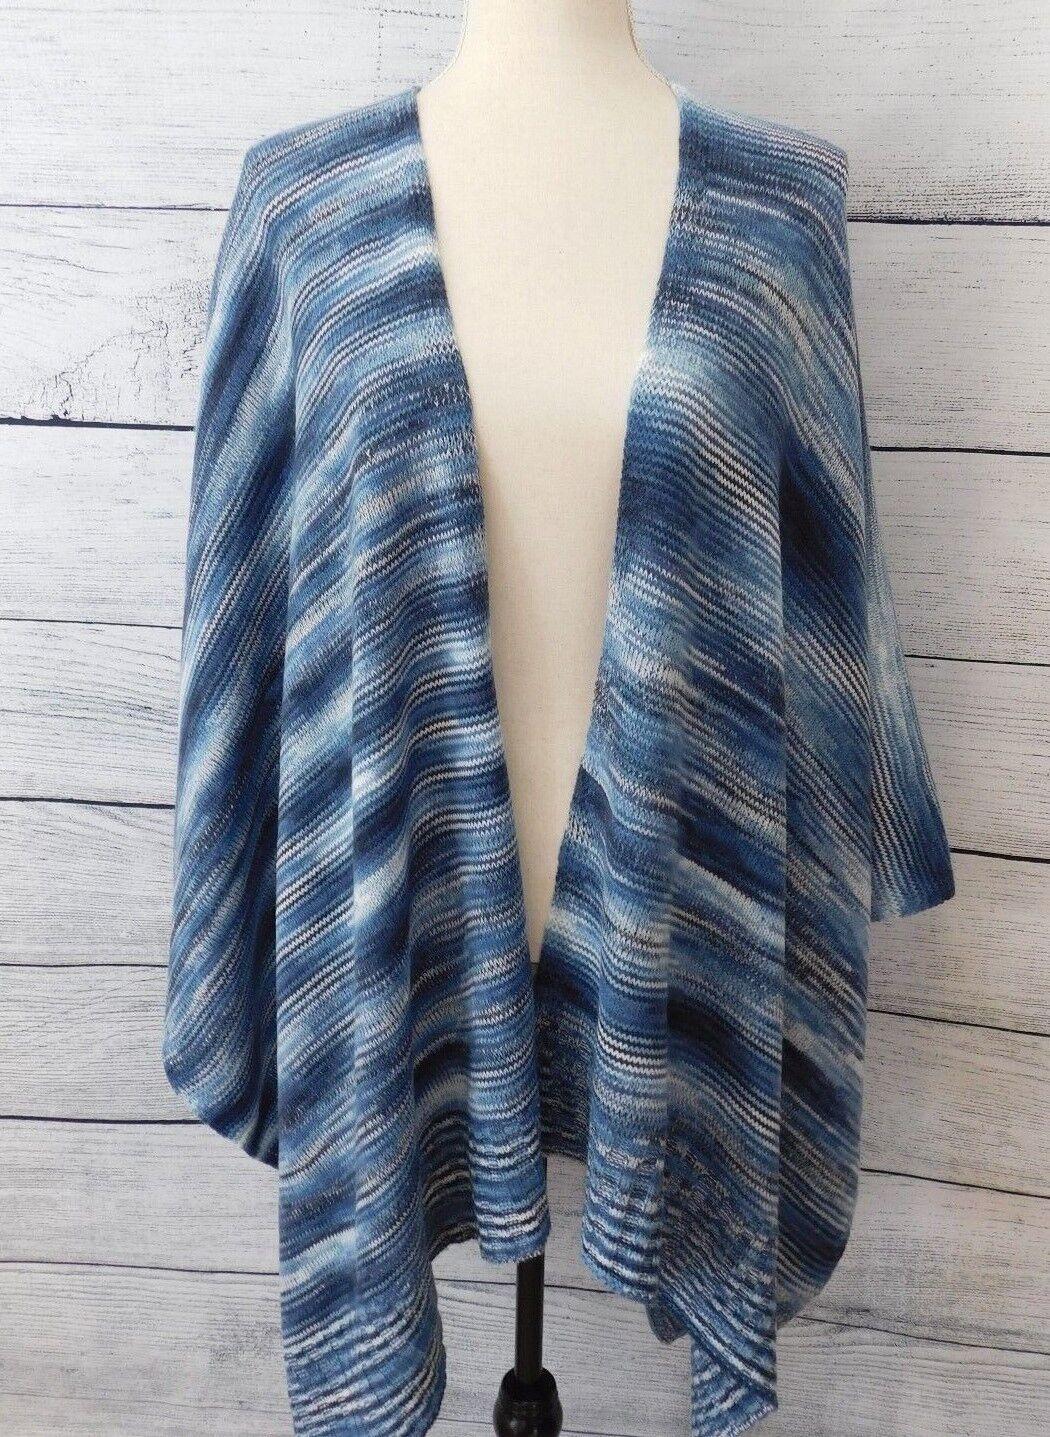 J. Jill Womens Wrap Sweater Navy bluee Ivory Ivory Ivory One Size Multi Marled Knit Ruana NEW e39ada